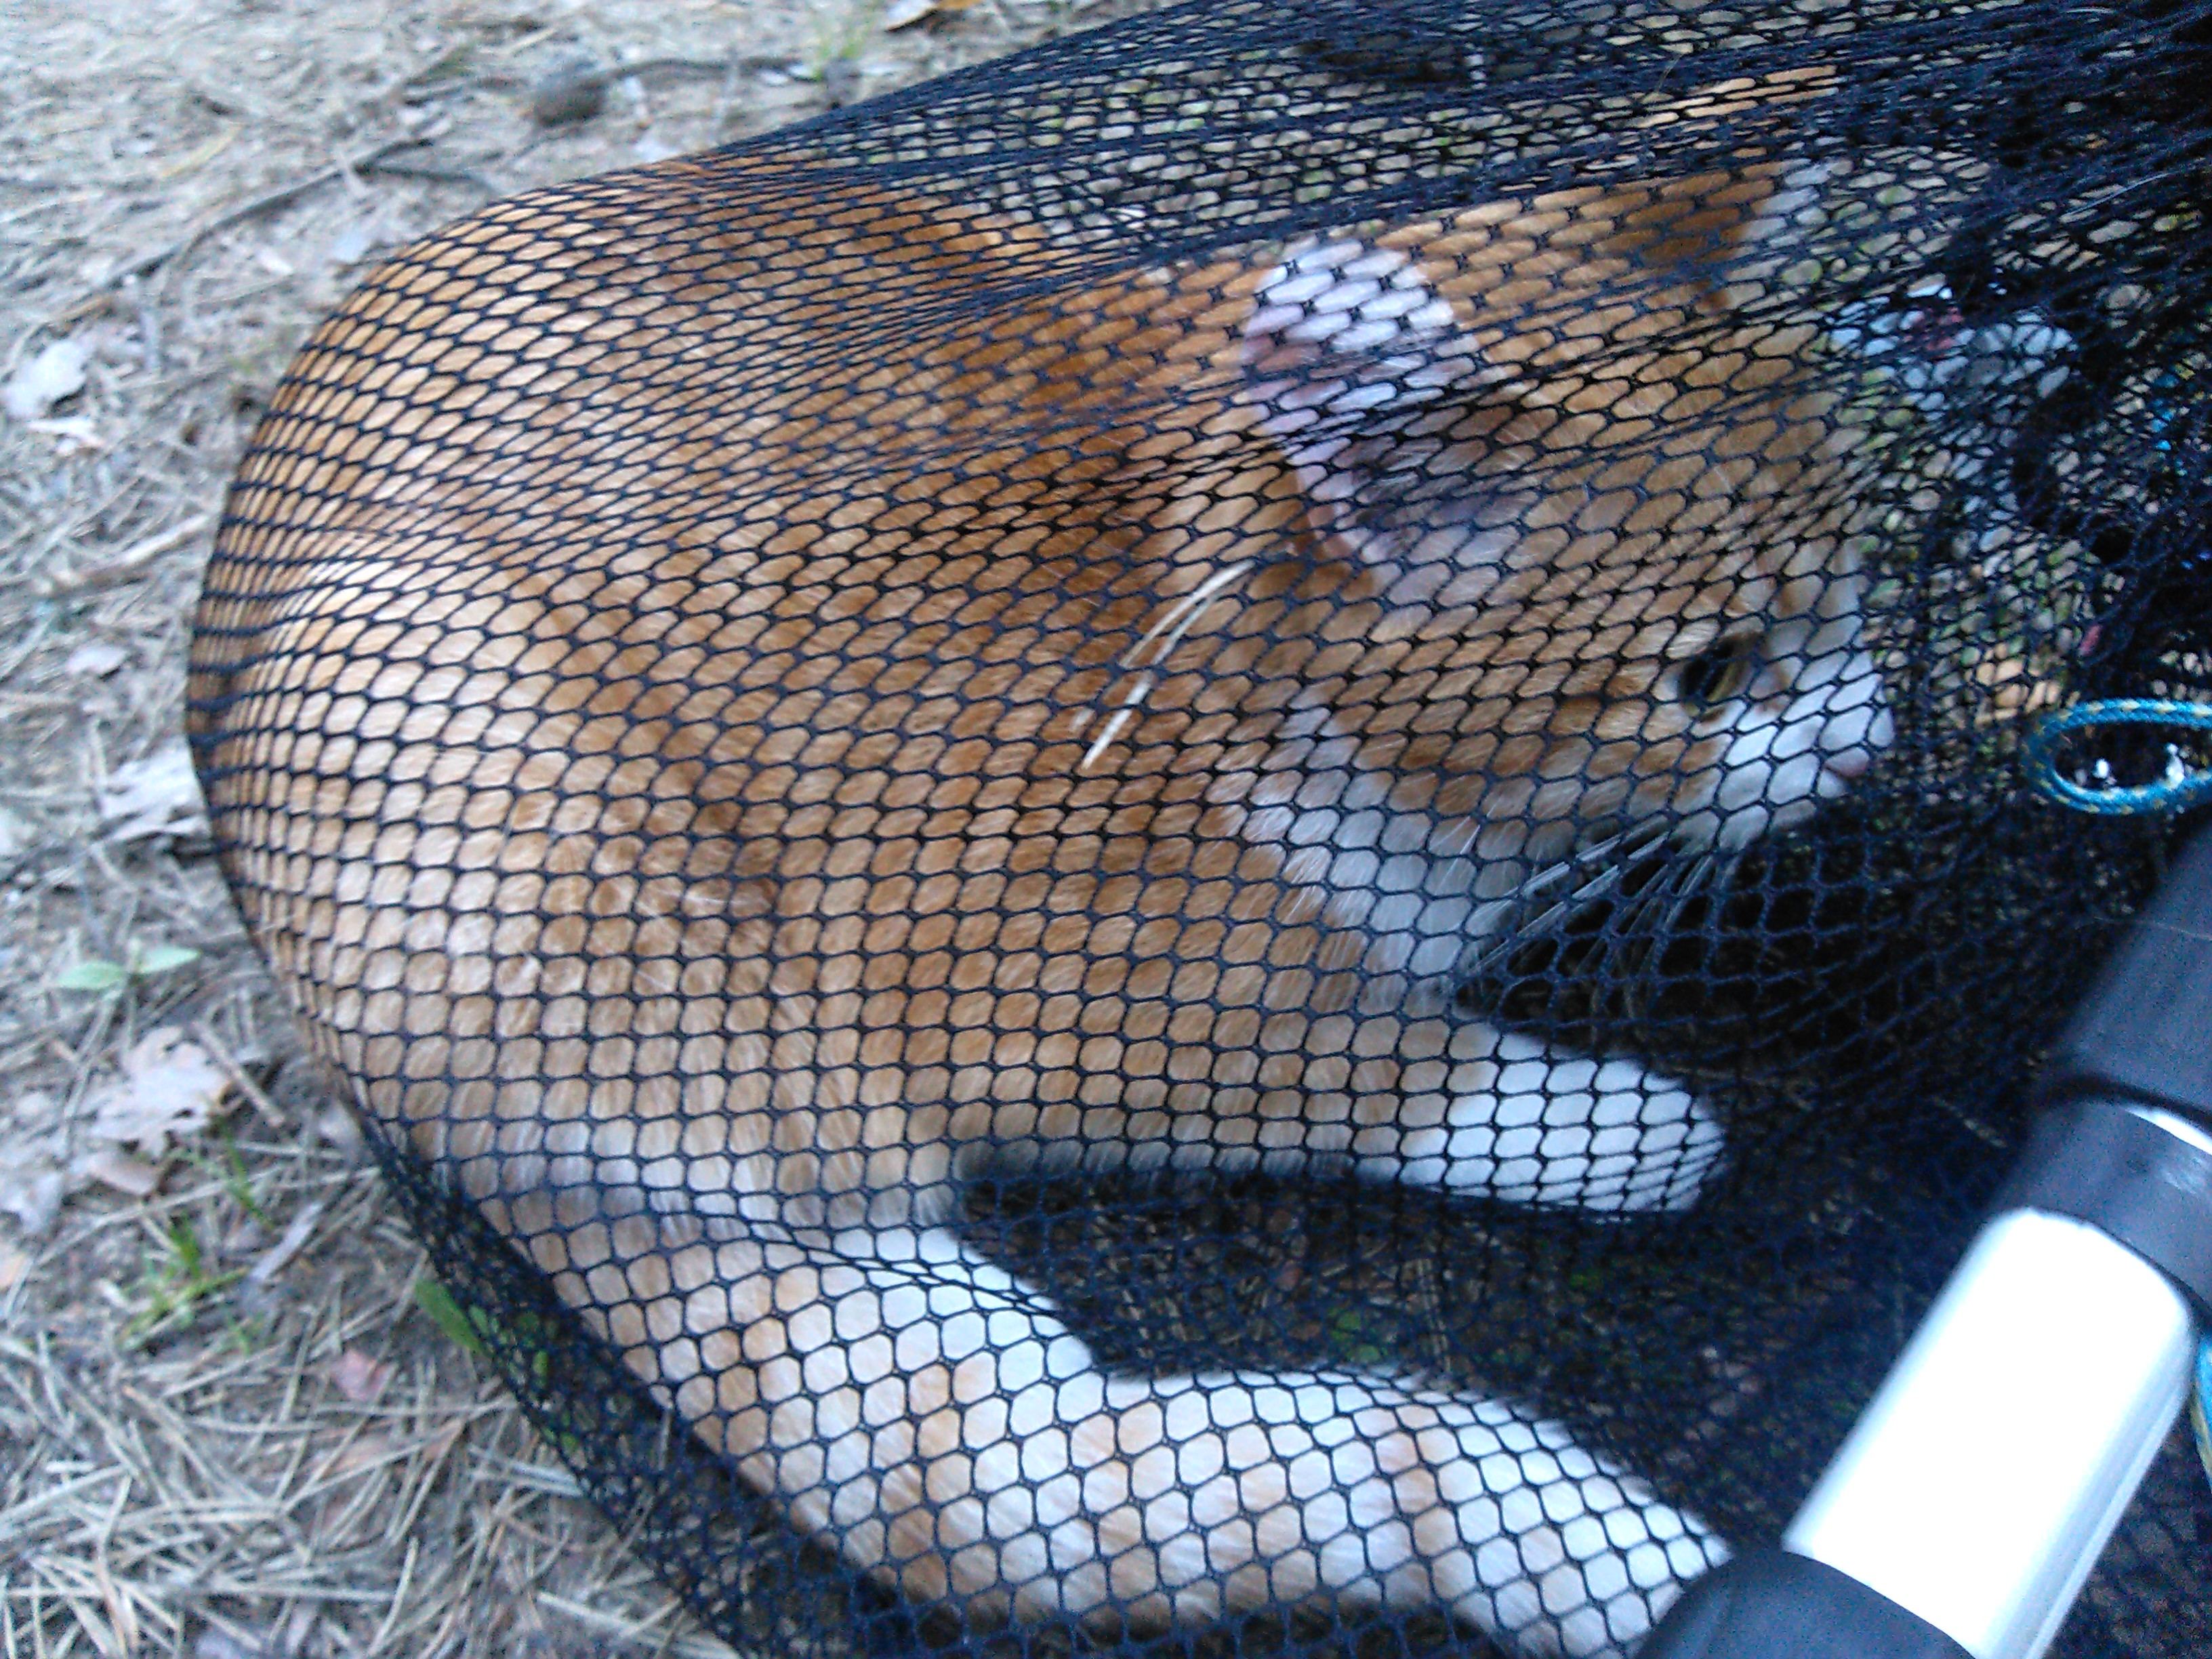 Кот на сосне, Токсово (вызов 599) 10b87b38a7c3